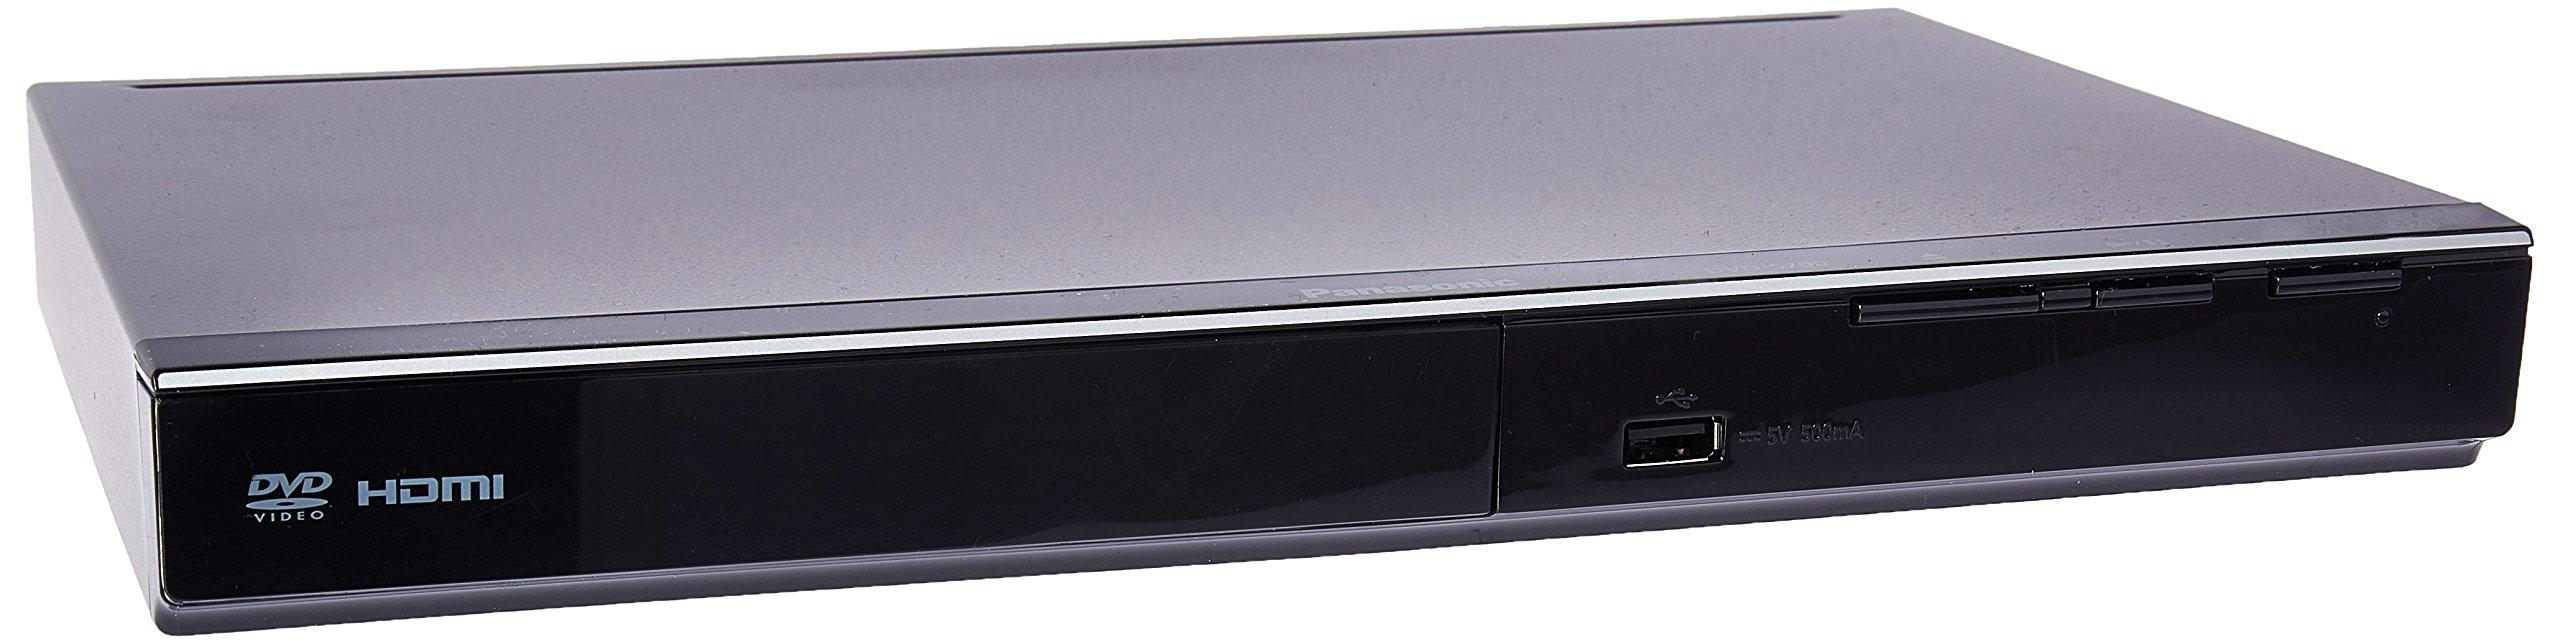 Panasonic S700EP K Up Conversion Playback slideshow